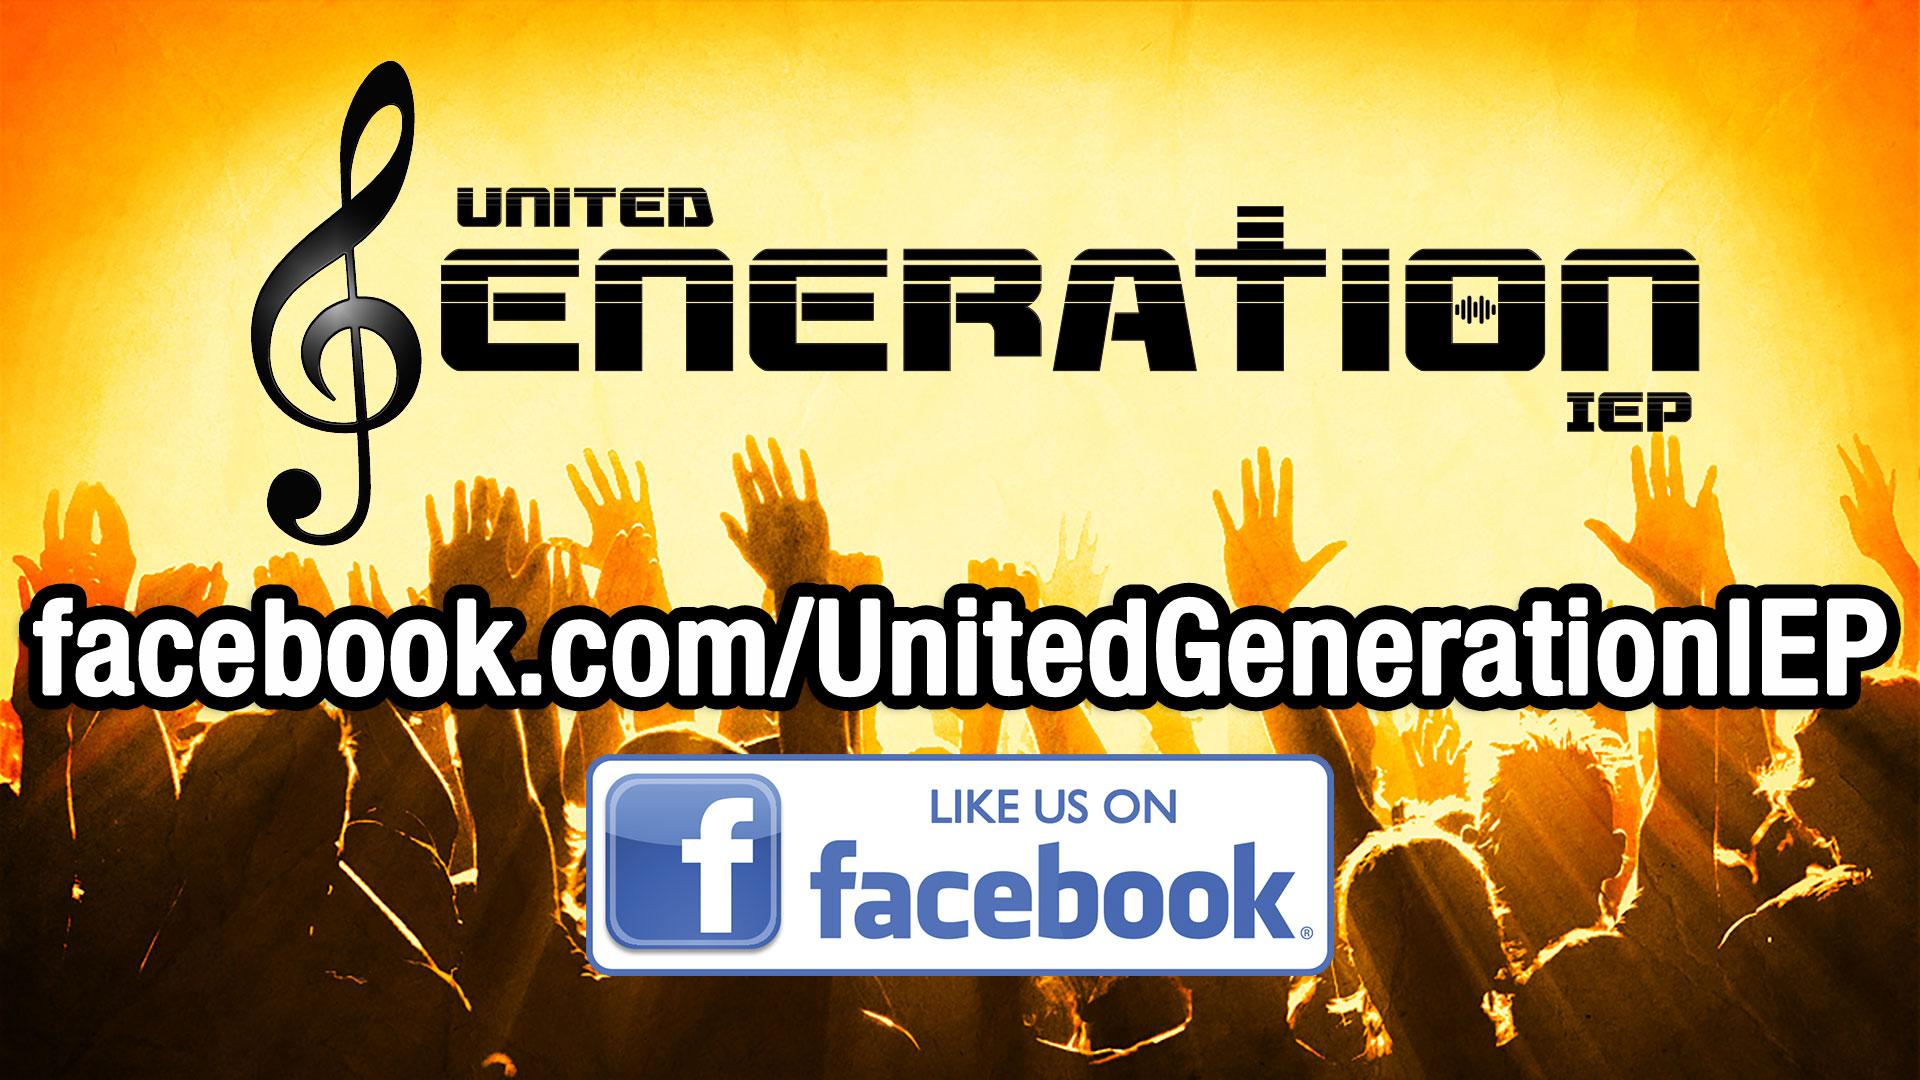 United Generation IEP